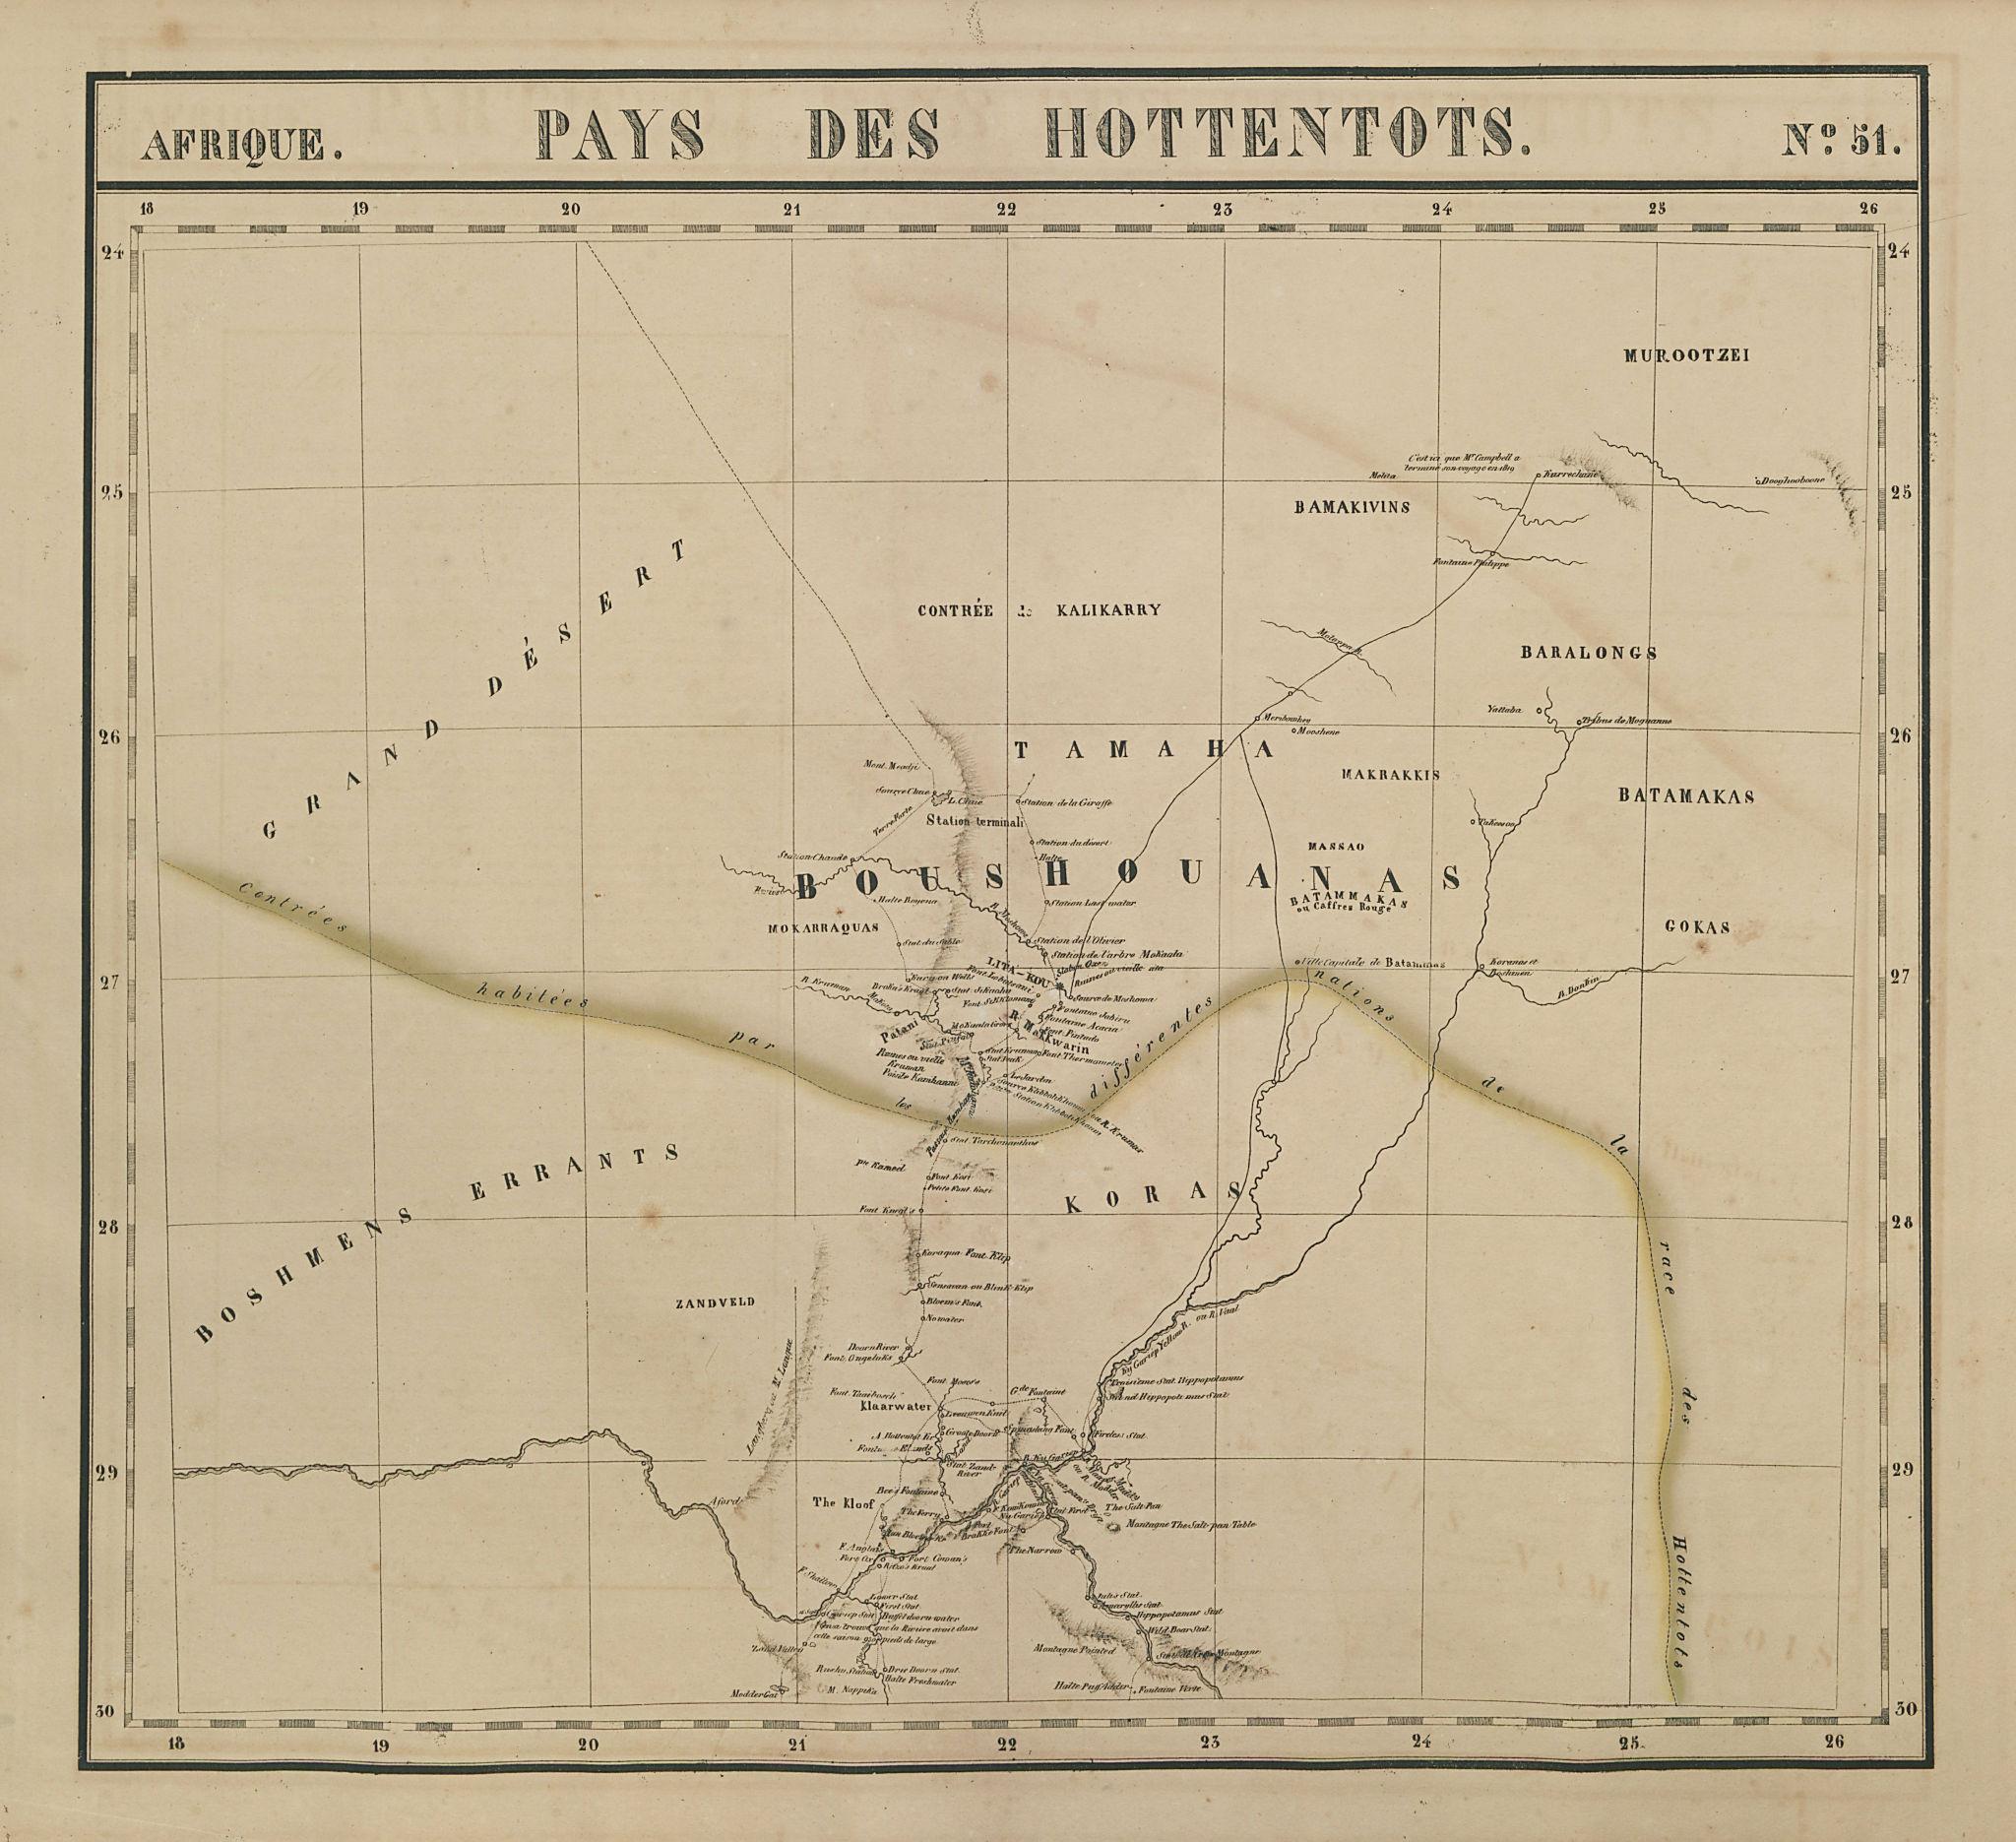 Afrique. Pays des Hottentots #51. Botswana South Africa. VANDERMAELEN 1827 map